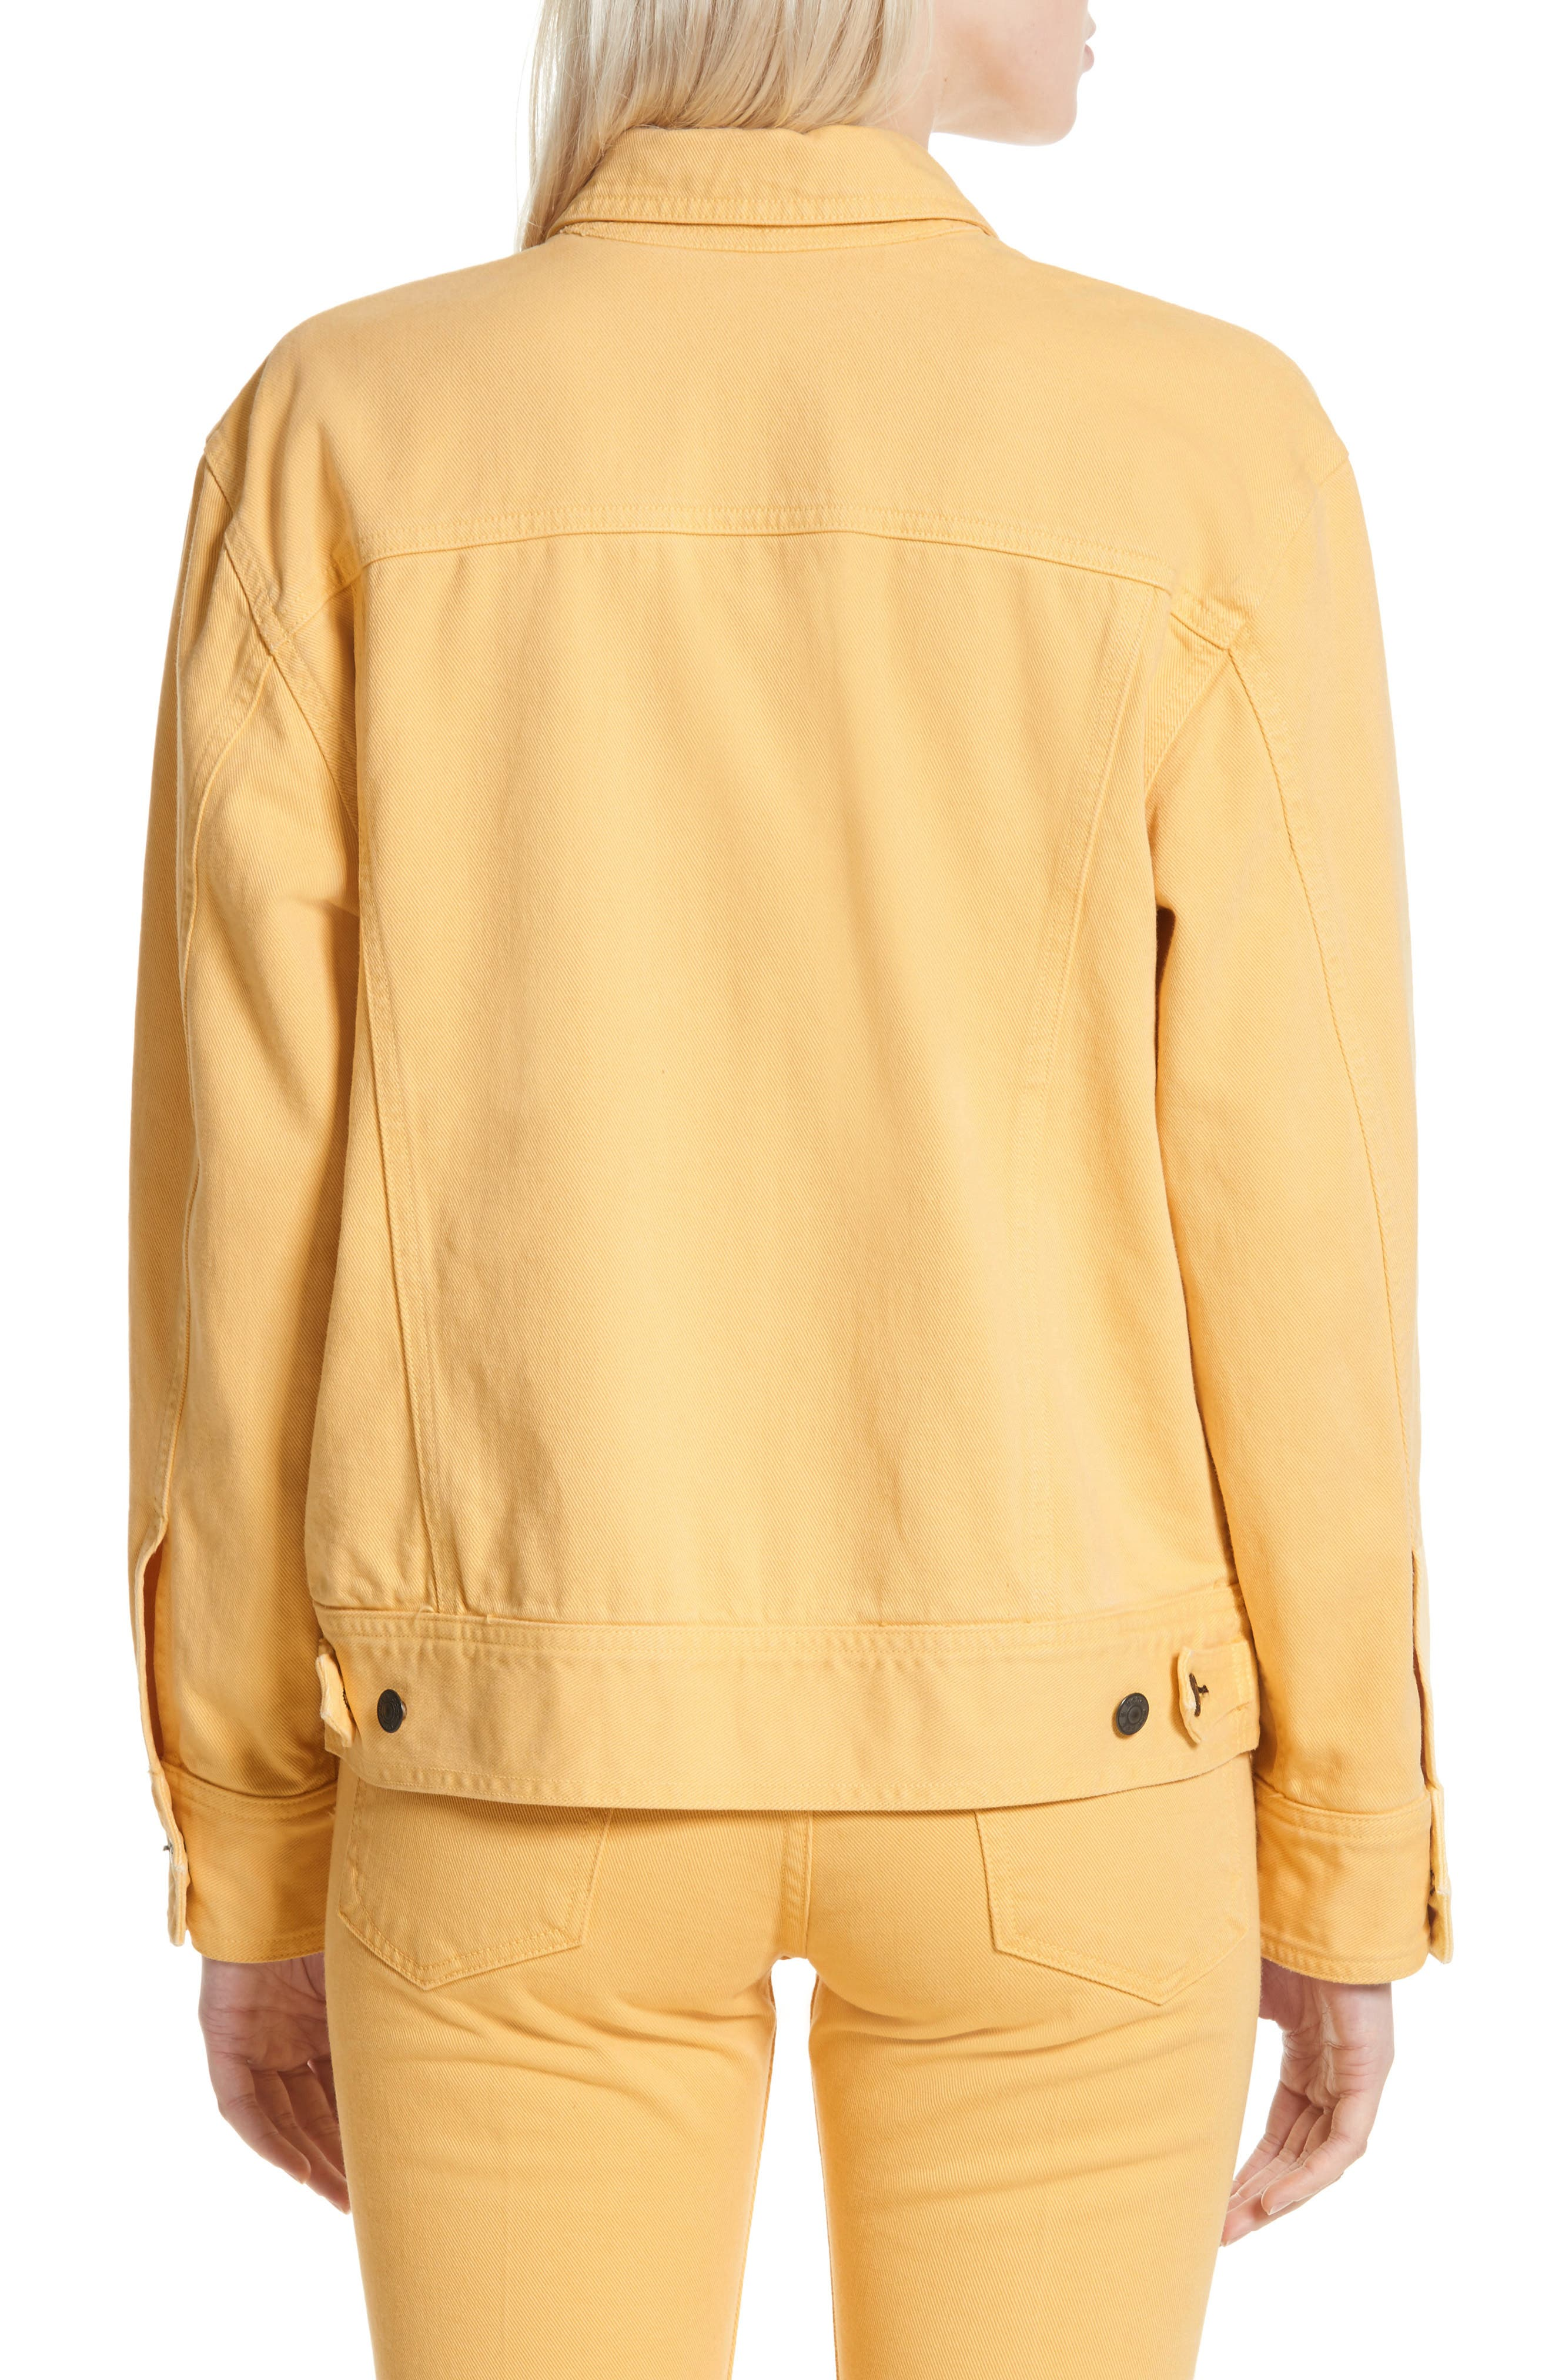 rag & bone Oversize Twill Jacket,                             Alternate thumbnail 2, color,                             730